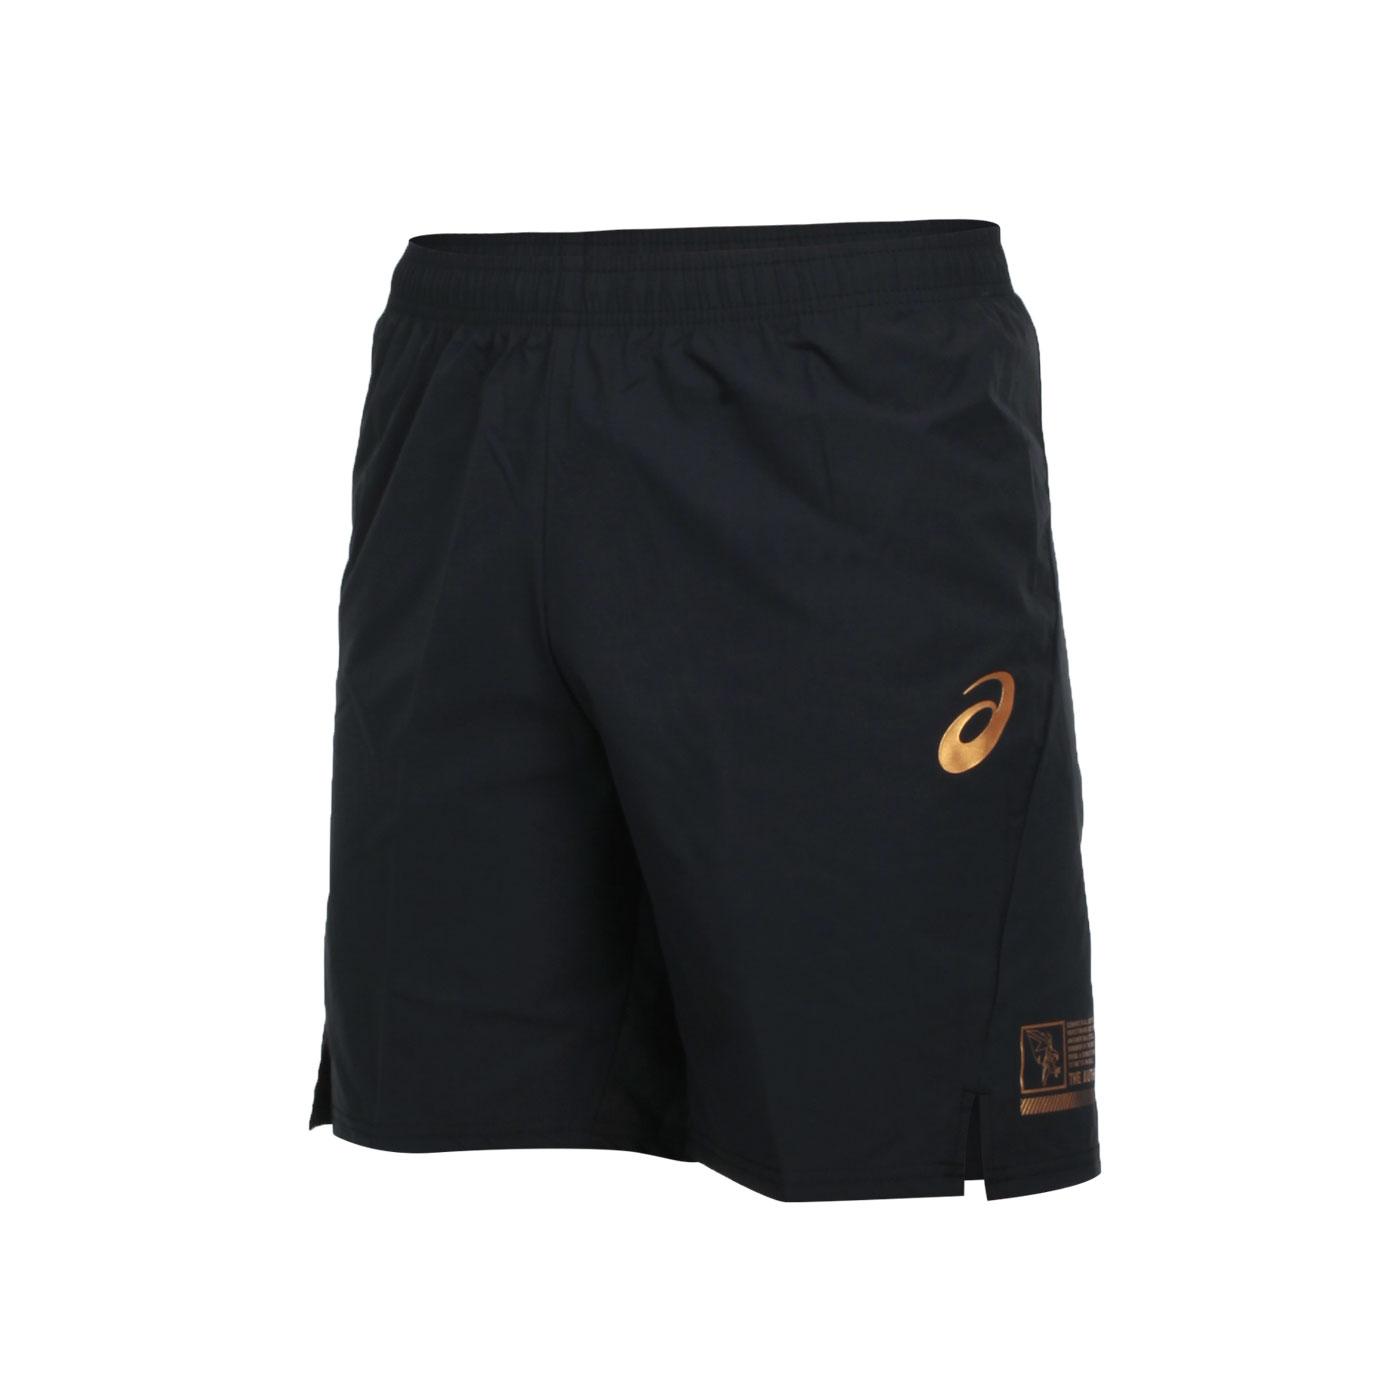 ASICS 男款排球短褲 2051A265-001 - 黑金